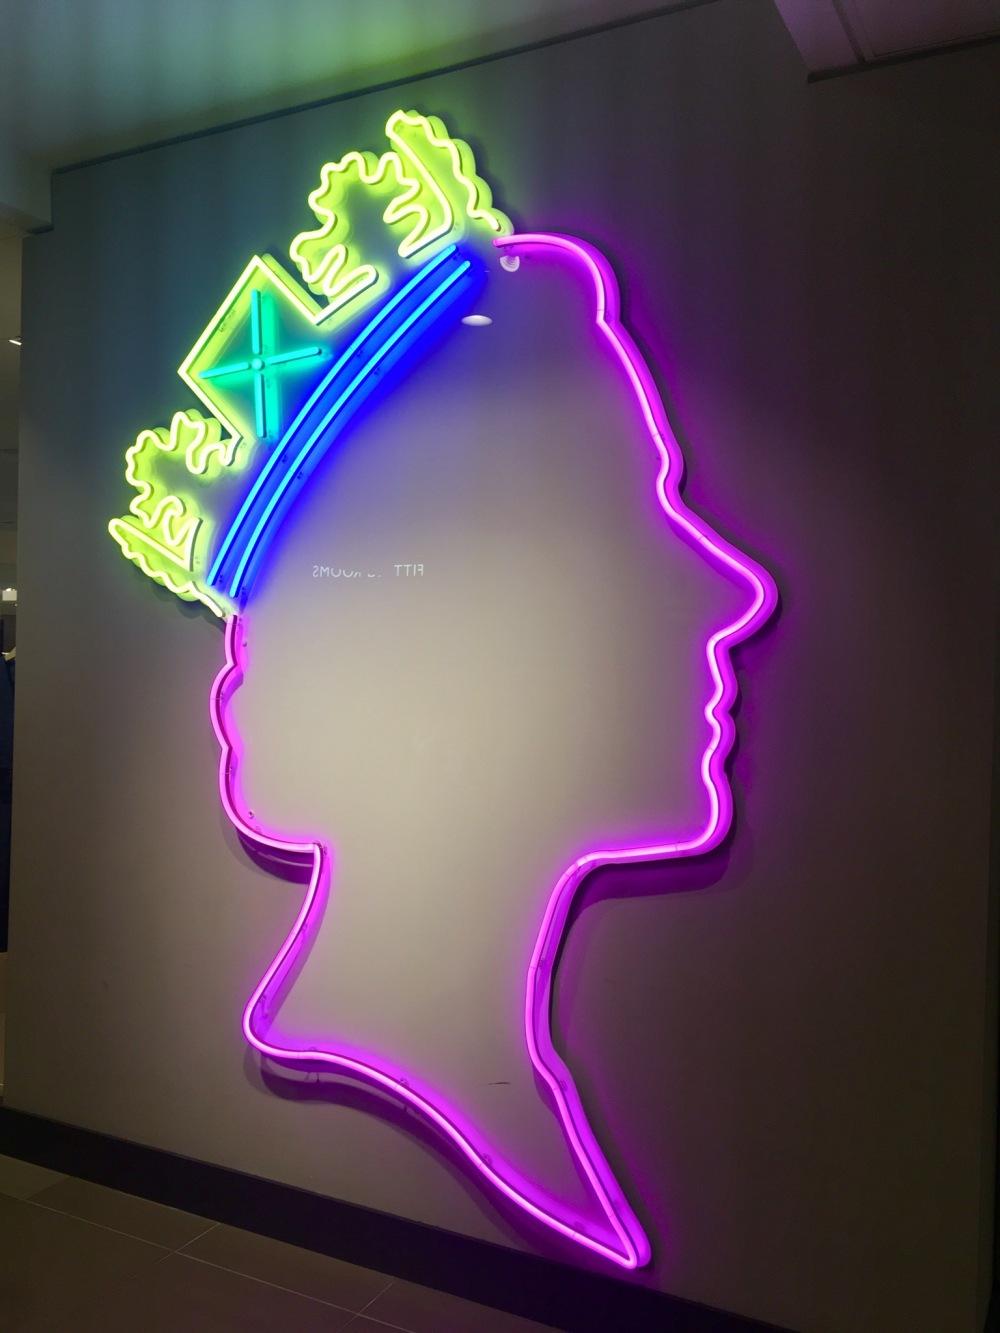 Neon_Queen,_John_Lewis_Oxford_Street,_August_2019_03.jpg